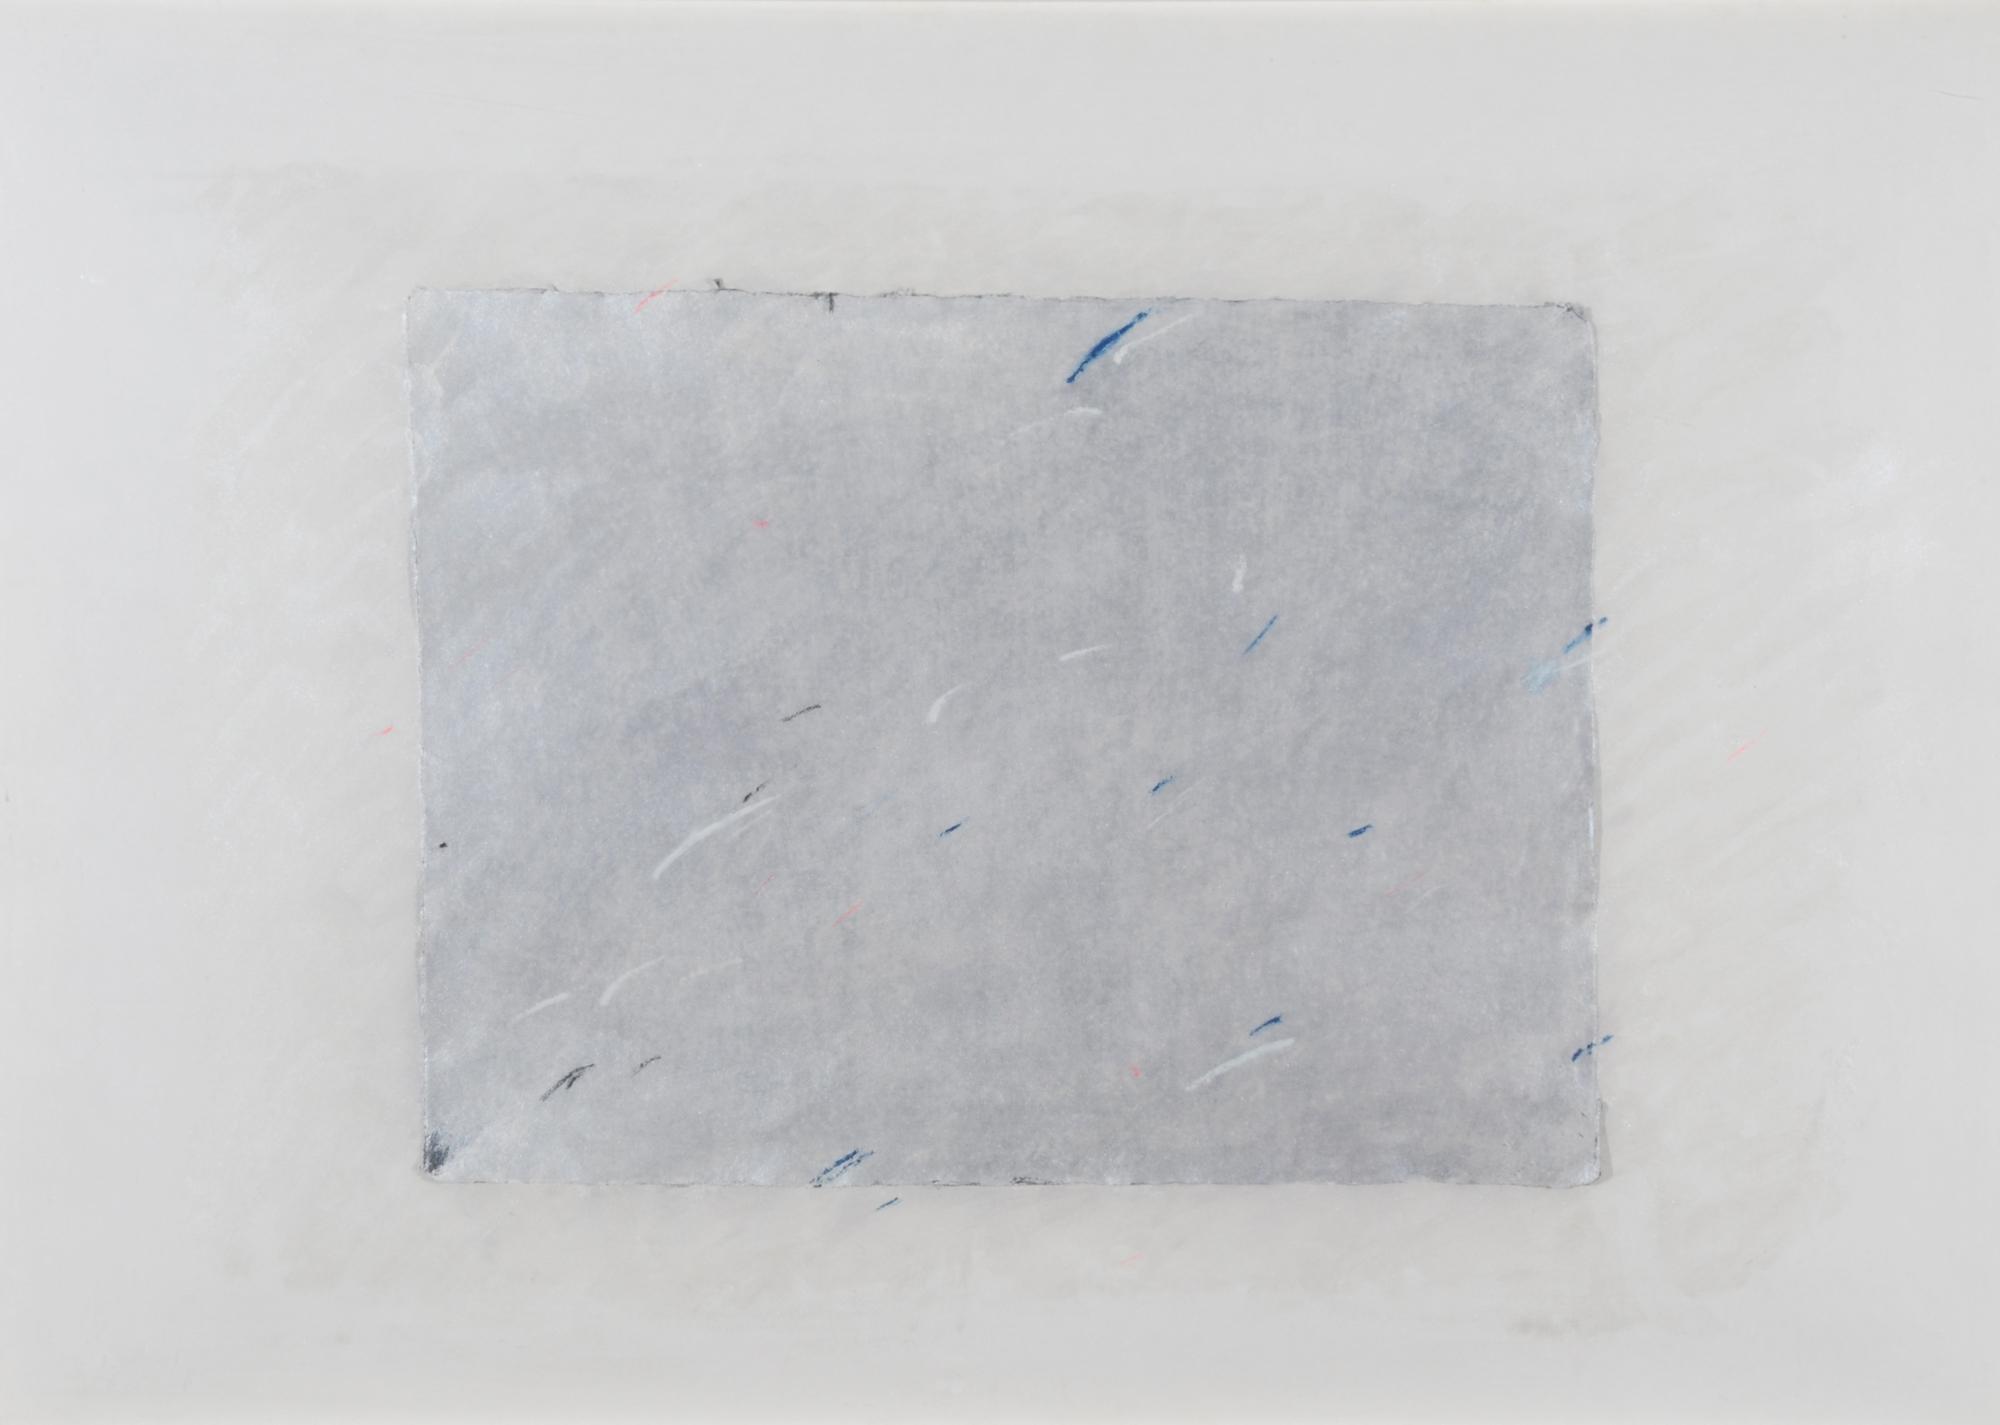 Gastini Marco, Untitled